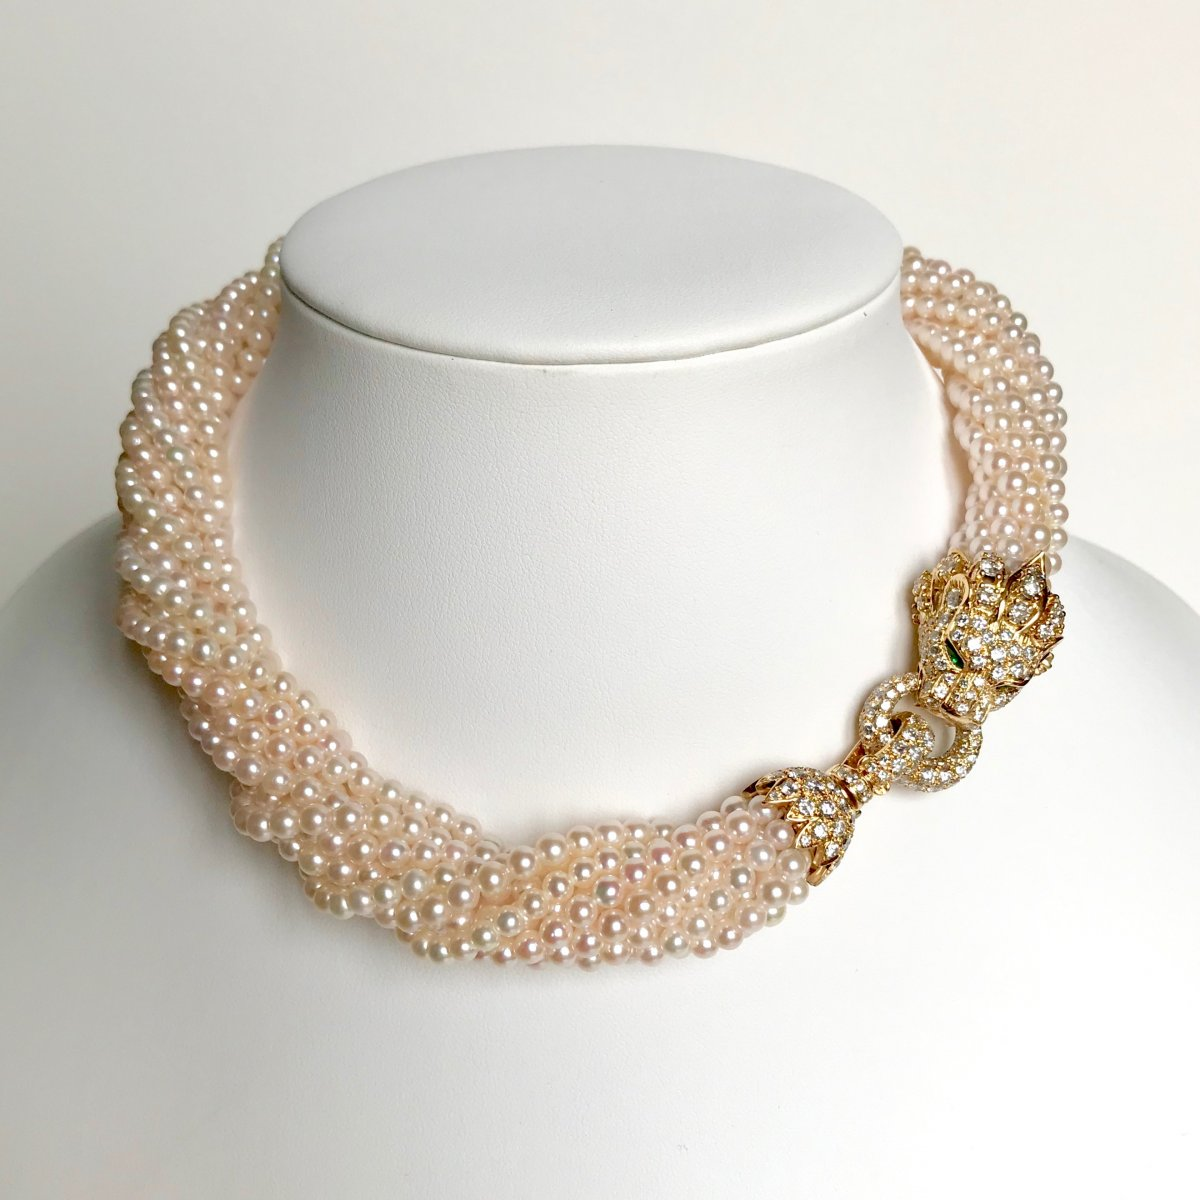 Van Cleef & Arpels Collier Barquerolles 11 Rangs Perles Fermoir Diamants